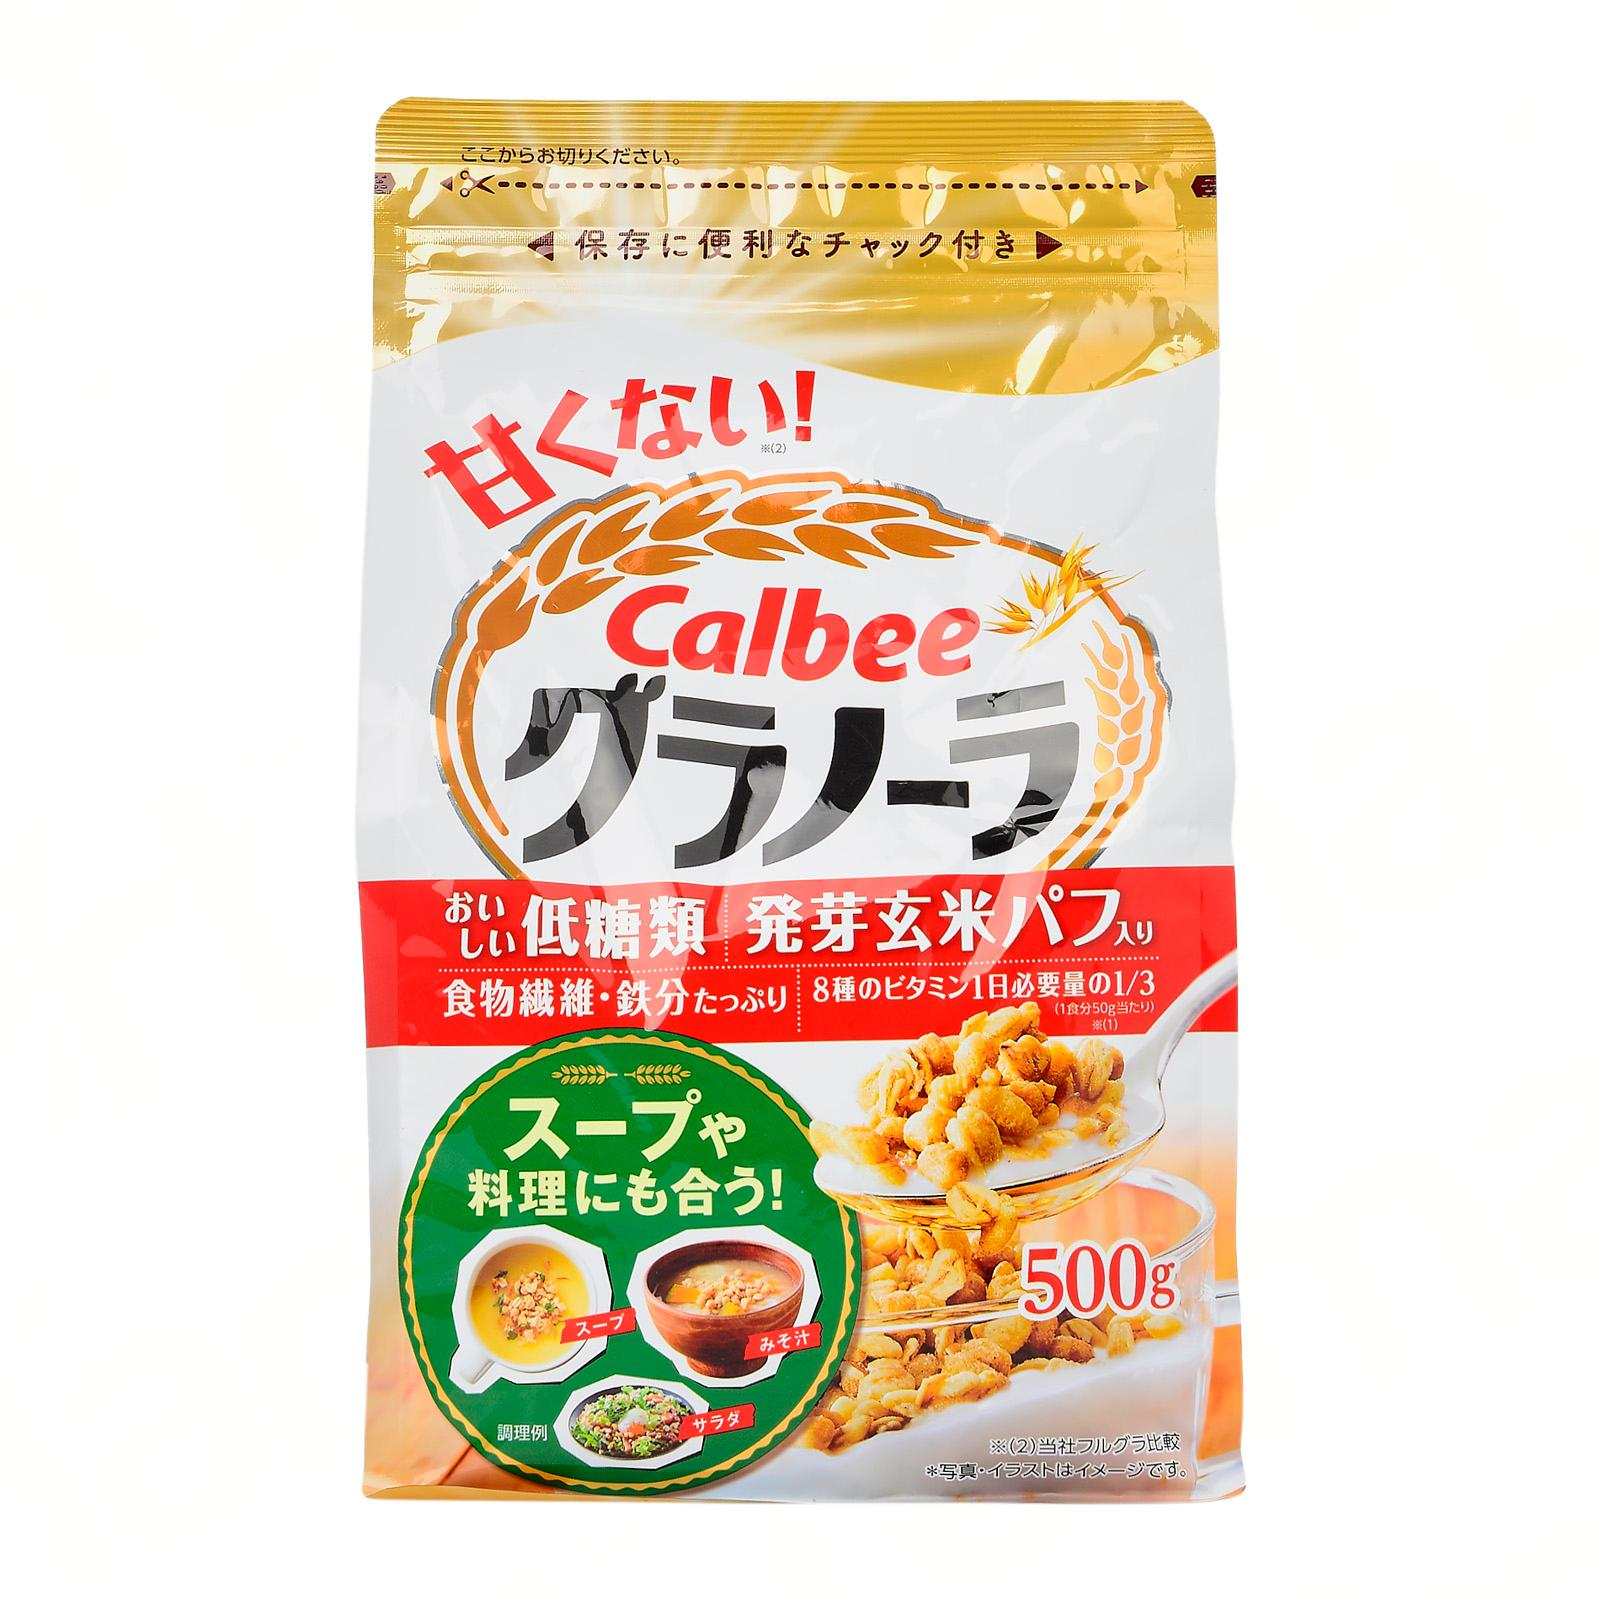 Calbee Unsweetened Granola